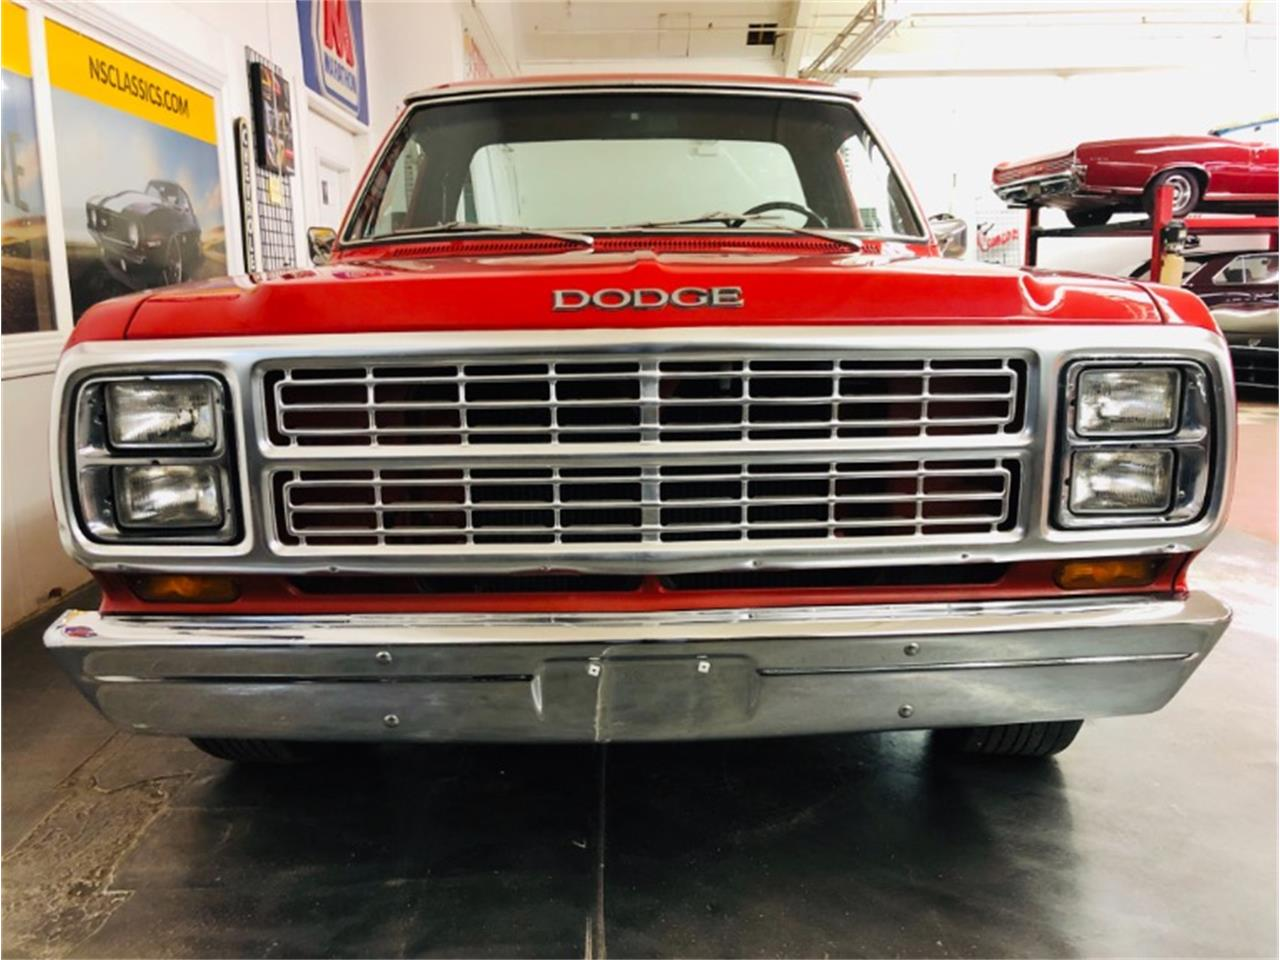 1979 Dodge Pickup (CC-1219637) for sale in Mundelein, Illinois